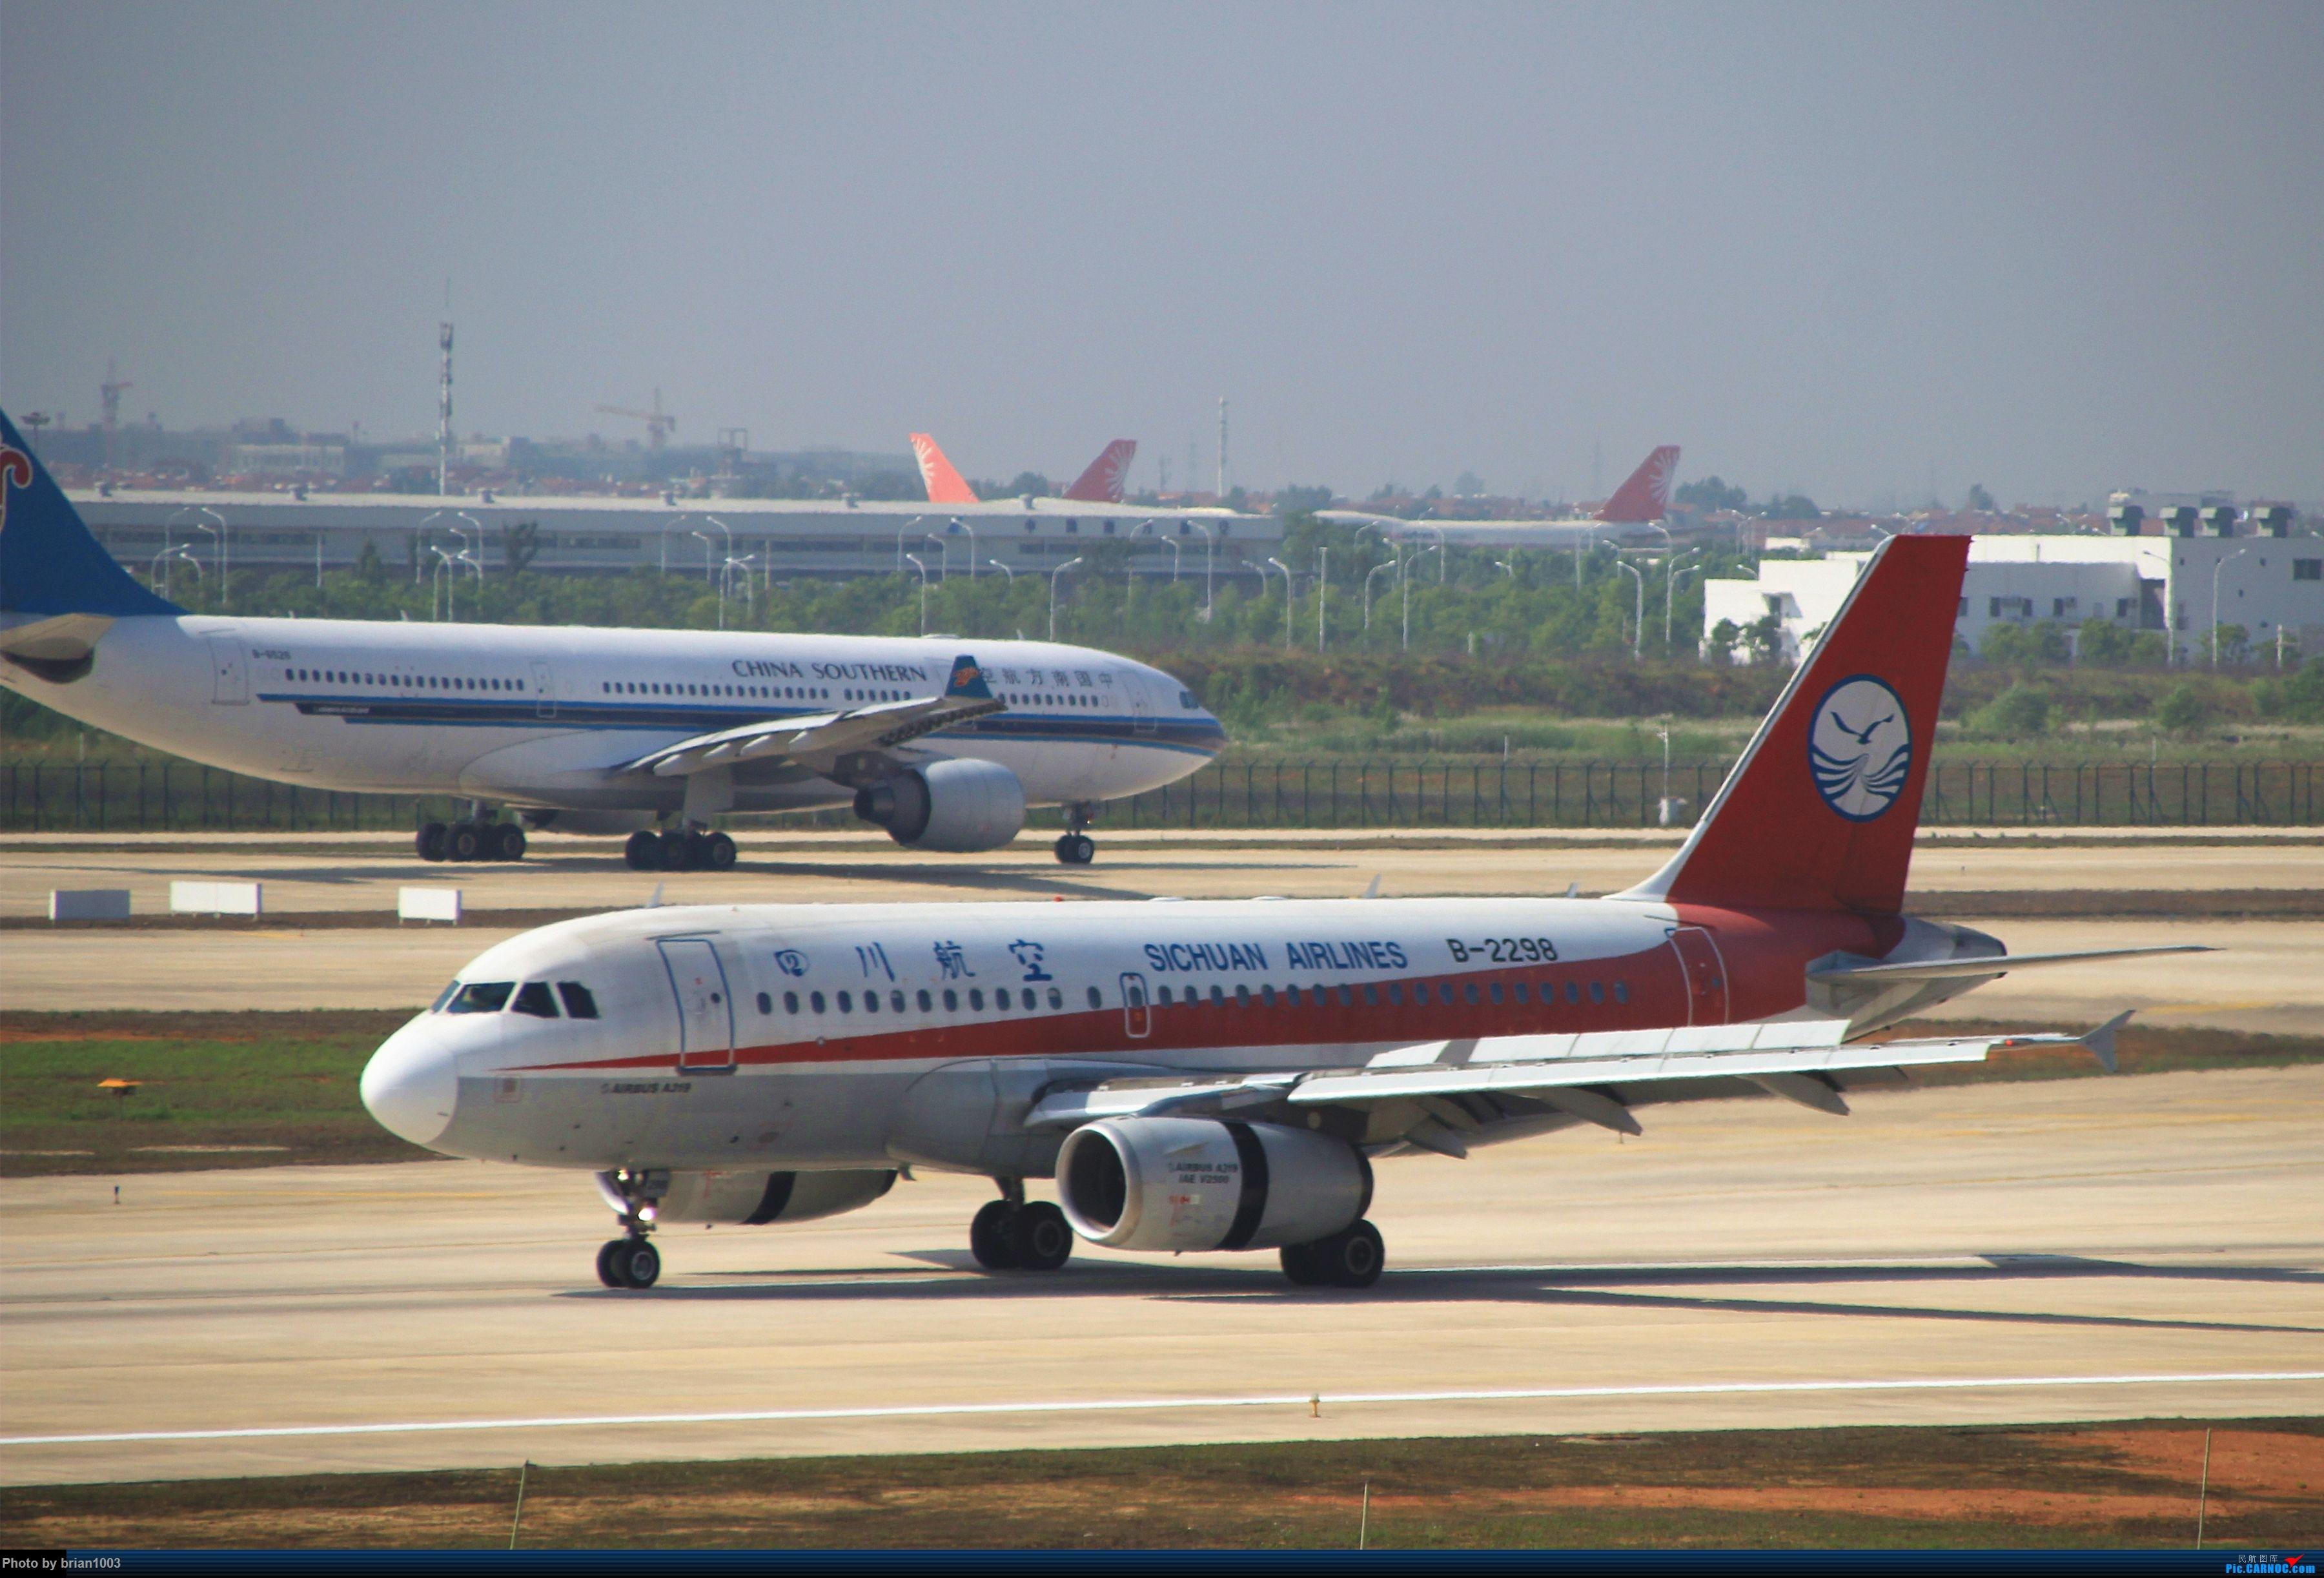 Re:[原创]WUH武汉天河机场拍机之喜迎酷航788和偶遇某其他飞机 AIRBUS A319-100 B-2298